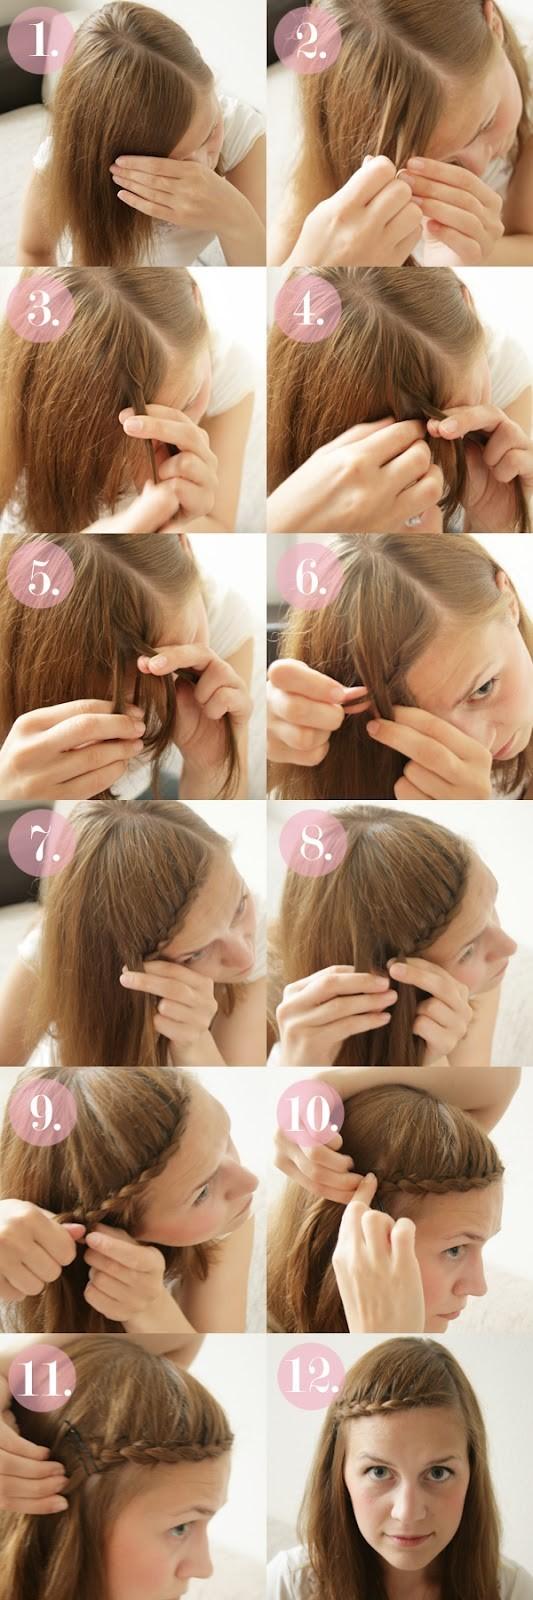 Prime 15 Braided Bangs Tutorials Cute Easy Hairstyles Pretty Designs Short Hairstyles Gunalazisus